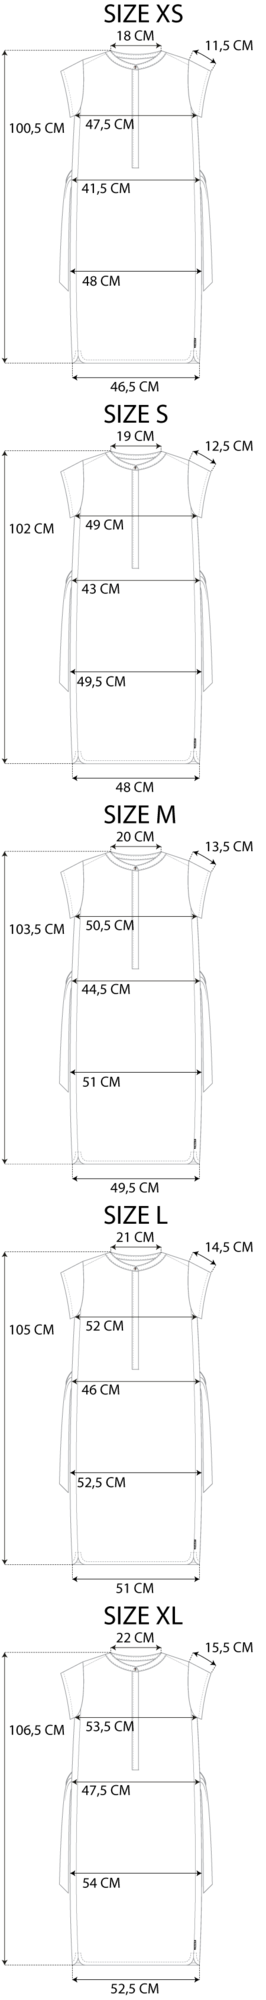 Maattabel le essential robe